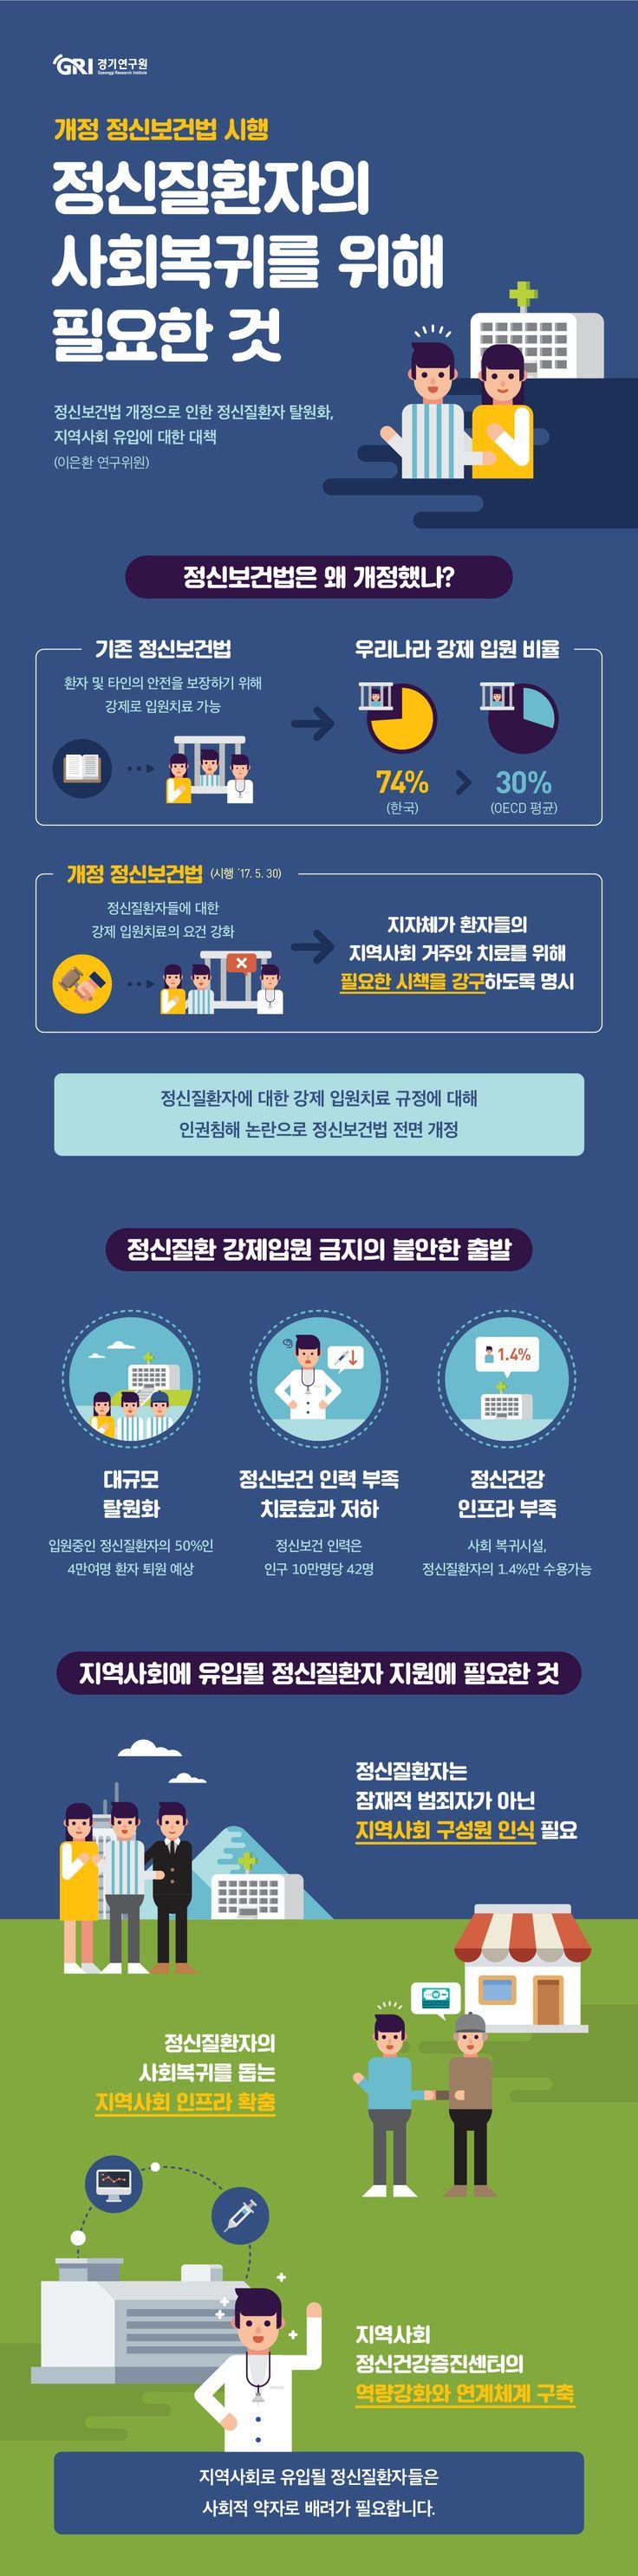 [infographic] '정신질환자의 사회복귀를 위해 필요한 것'에 대한 인포그래픽